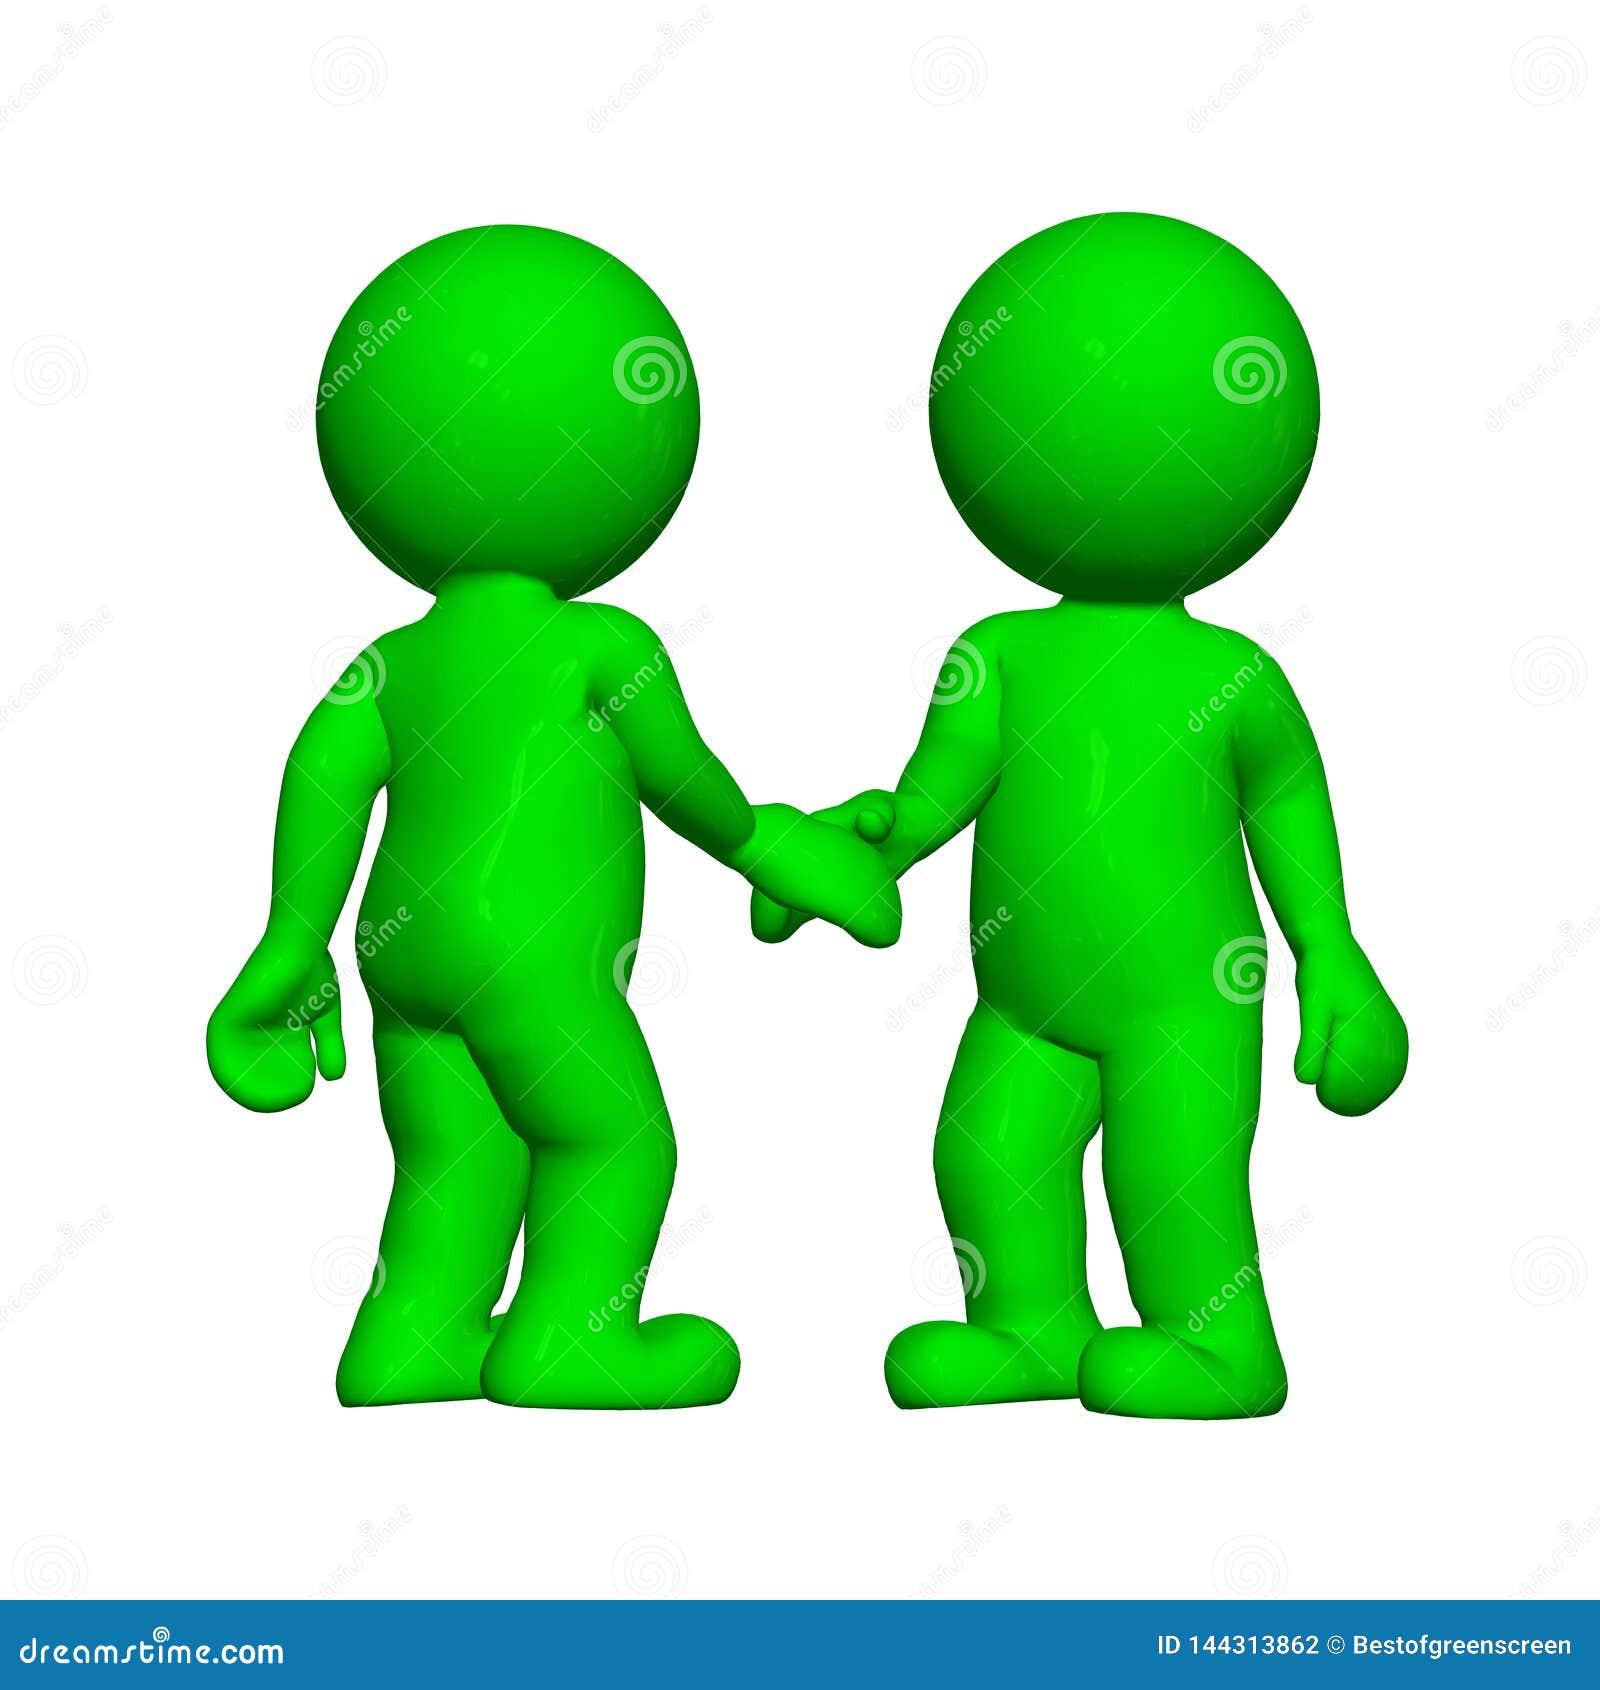 Groene 3D Mensen - Schokhanden - op witte achtergrond